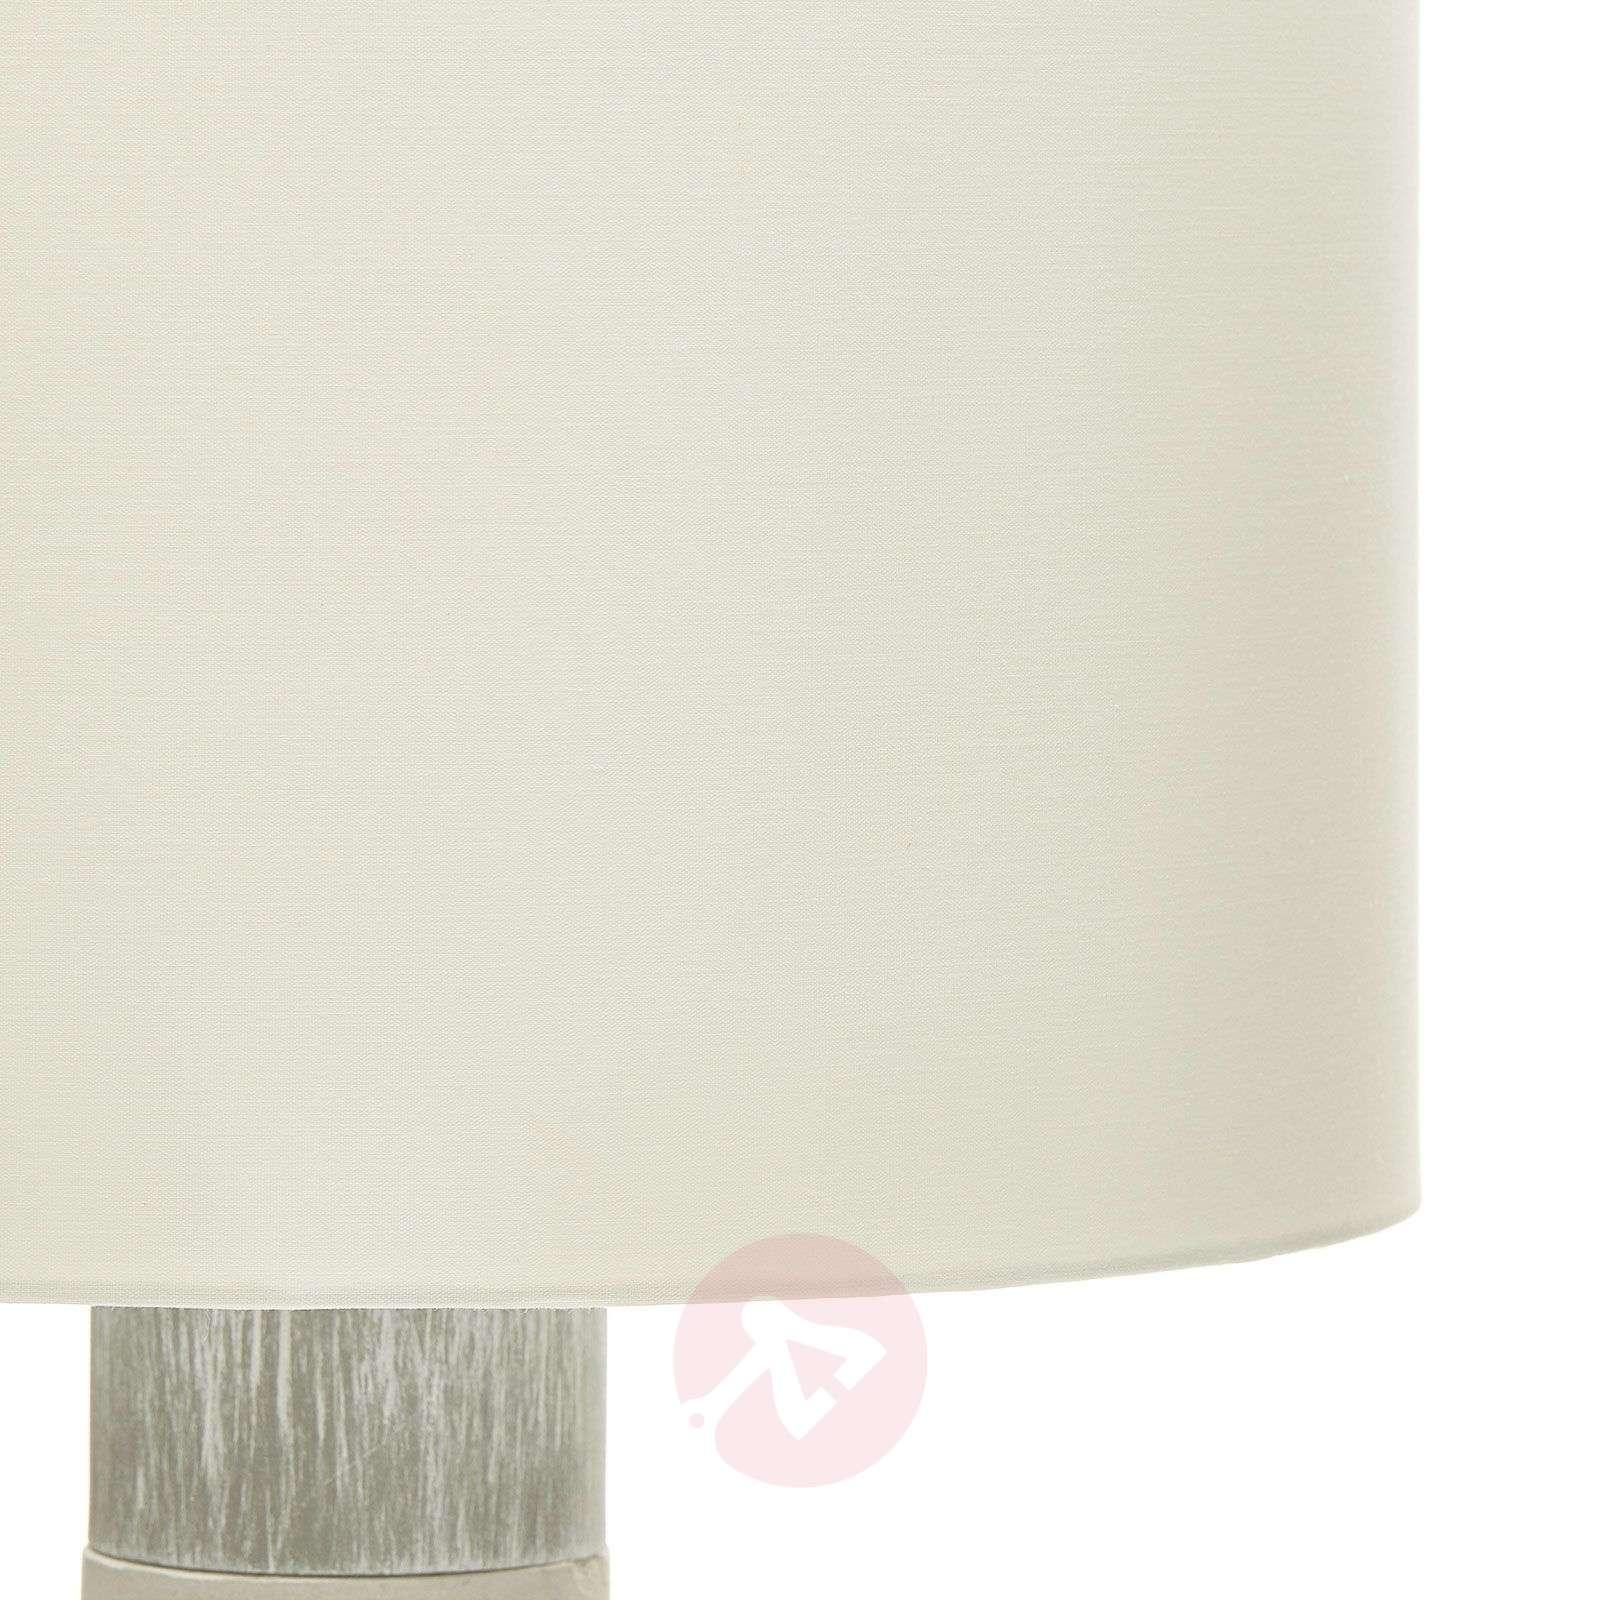 Betonipöytälamppu Tiziana, 51 cm-8032203-01